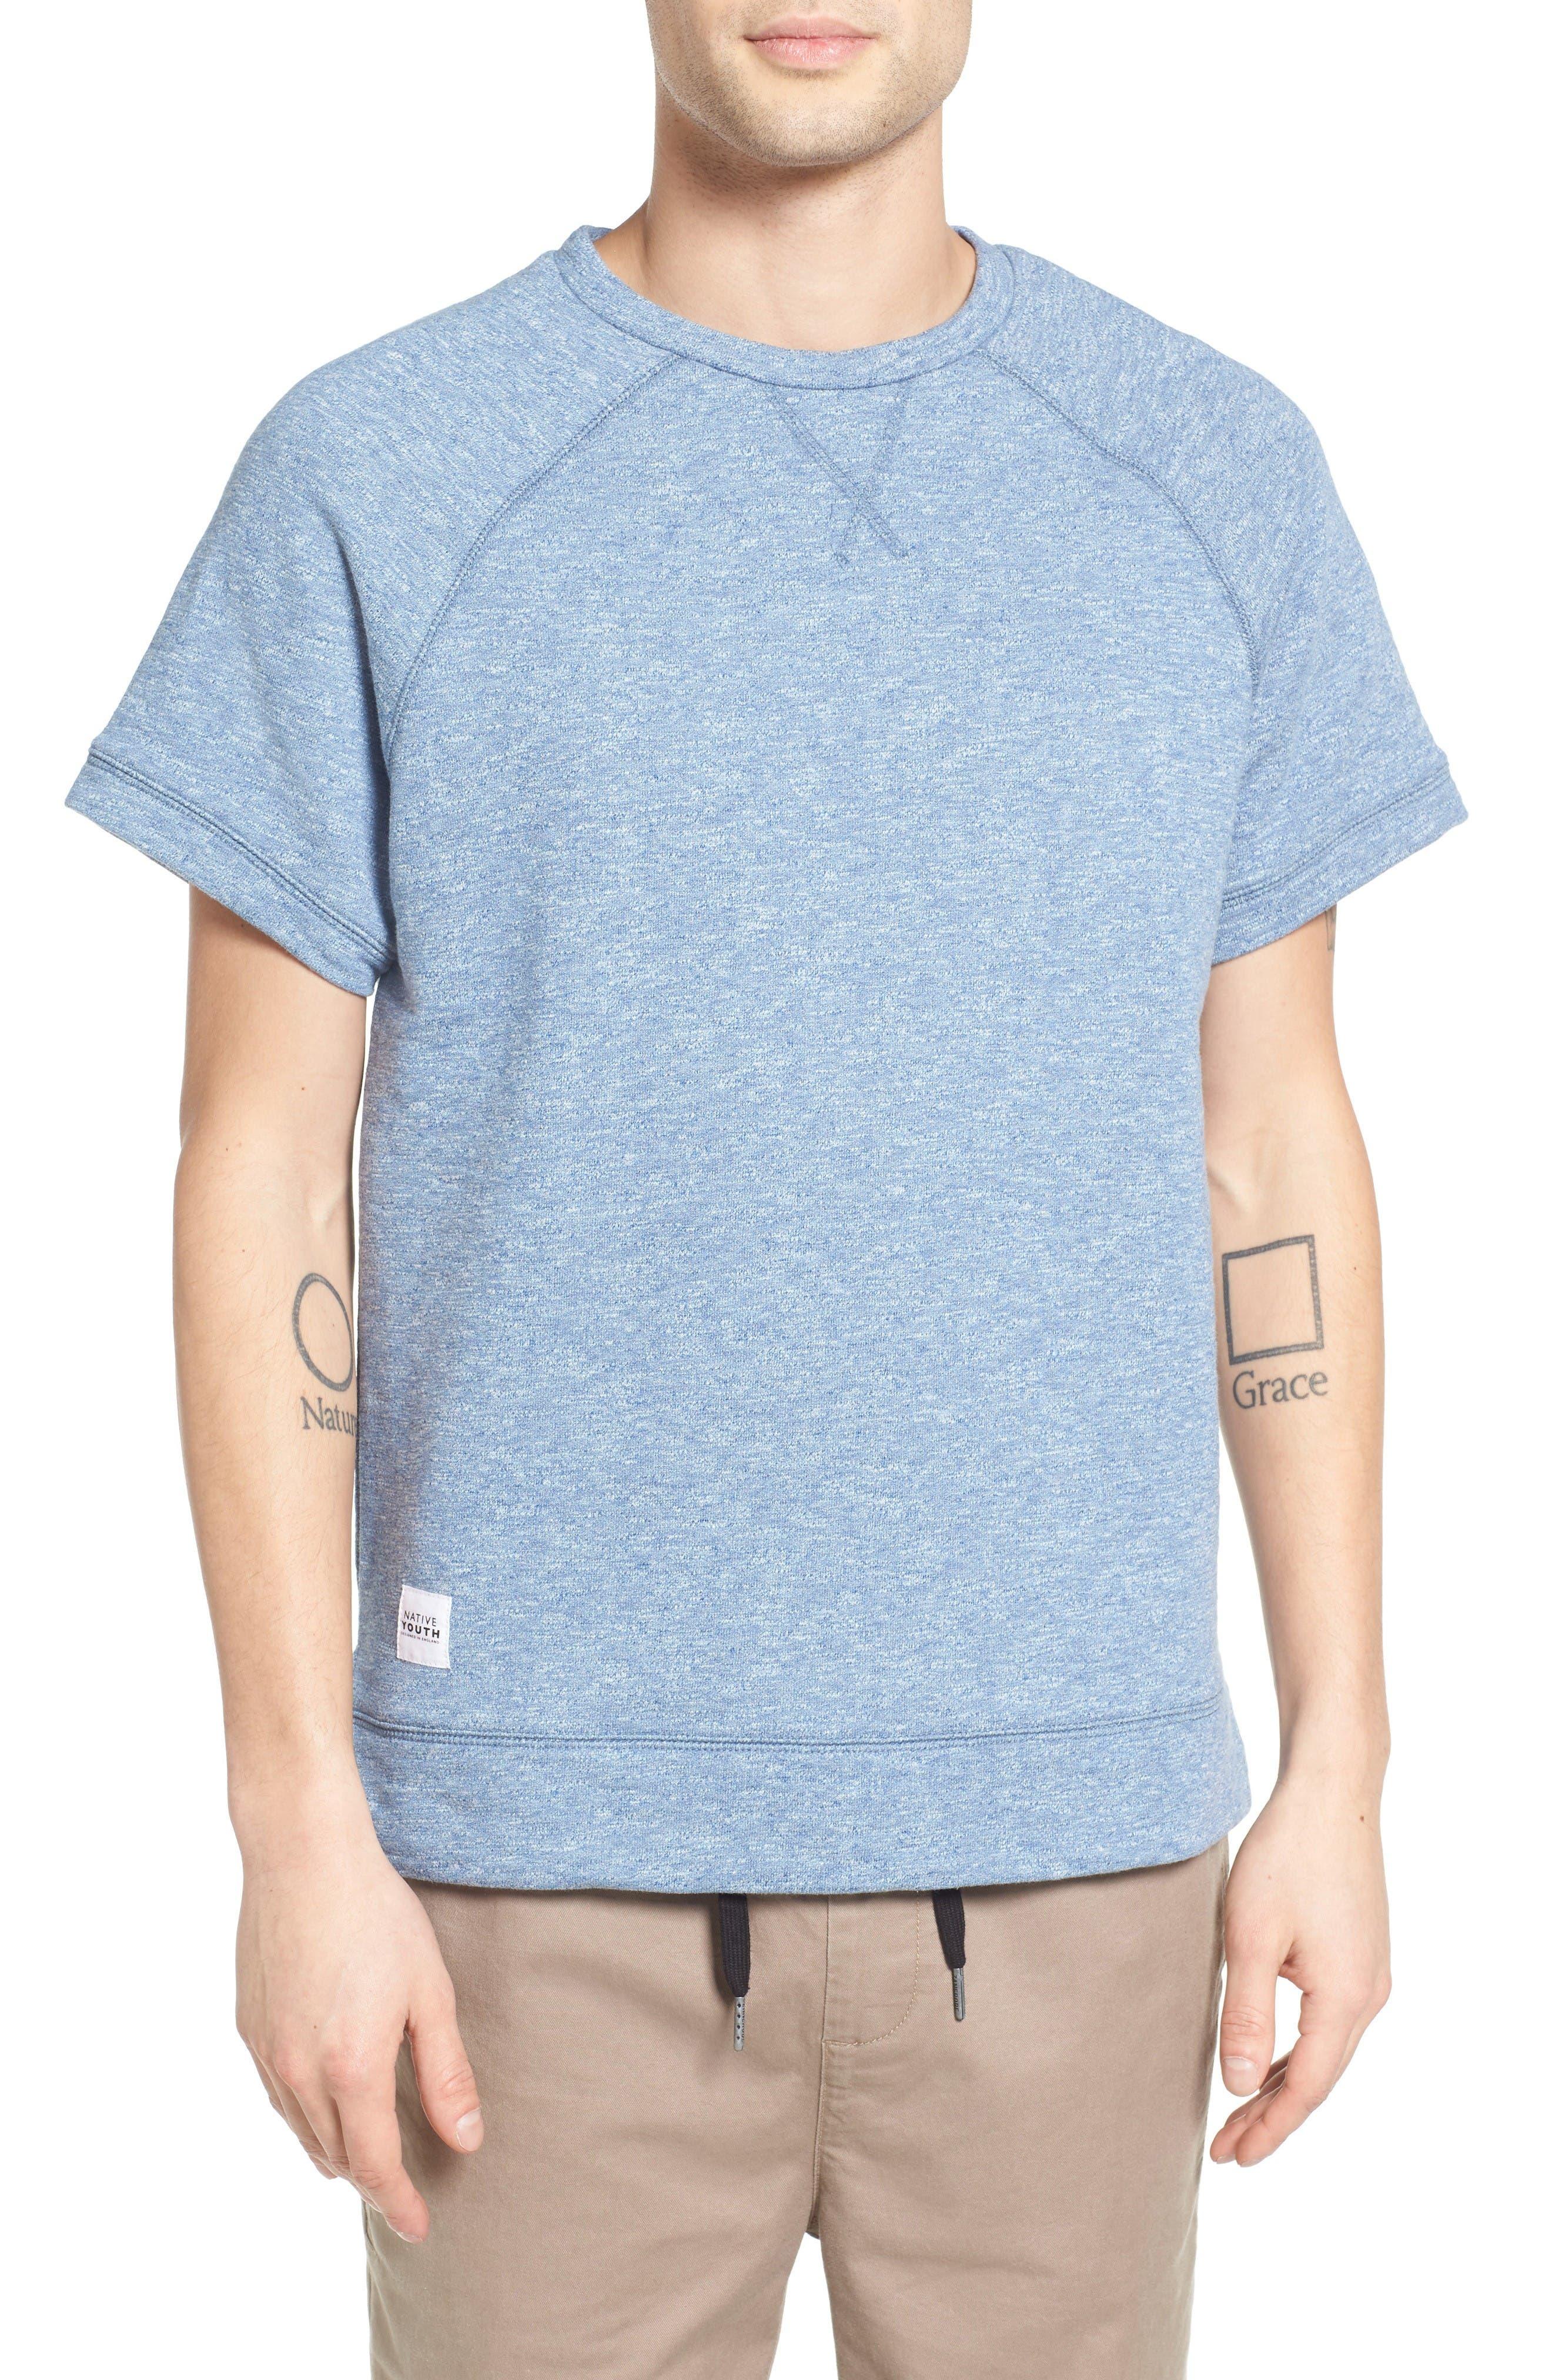 NATIVE YOUTH Milford Short Sleeve Sweatshirt